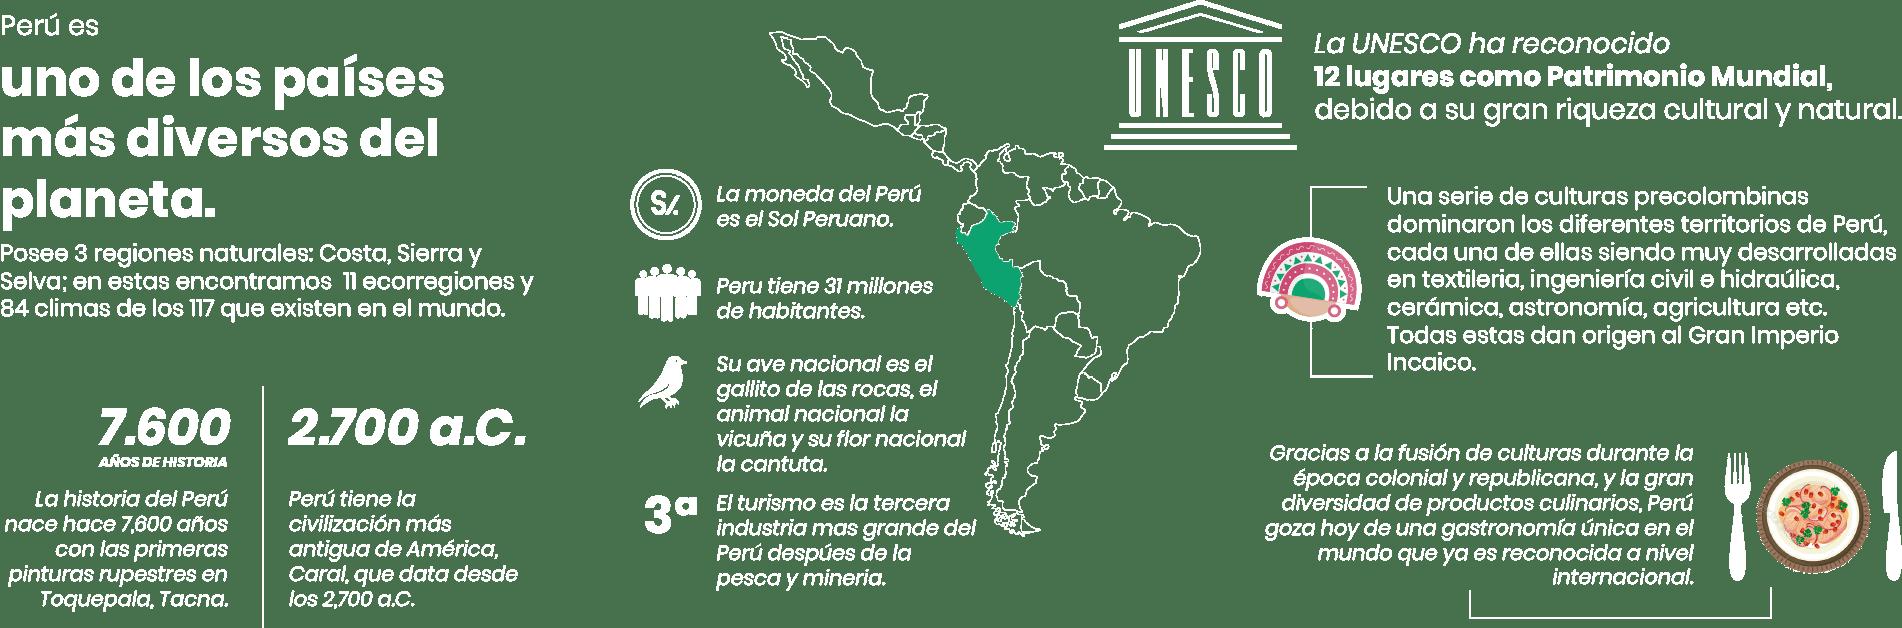 infografia-info-peru